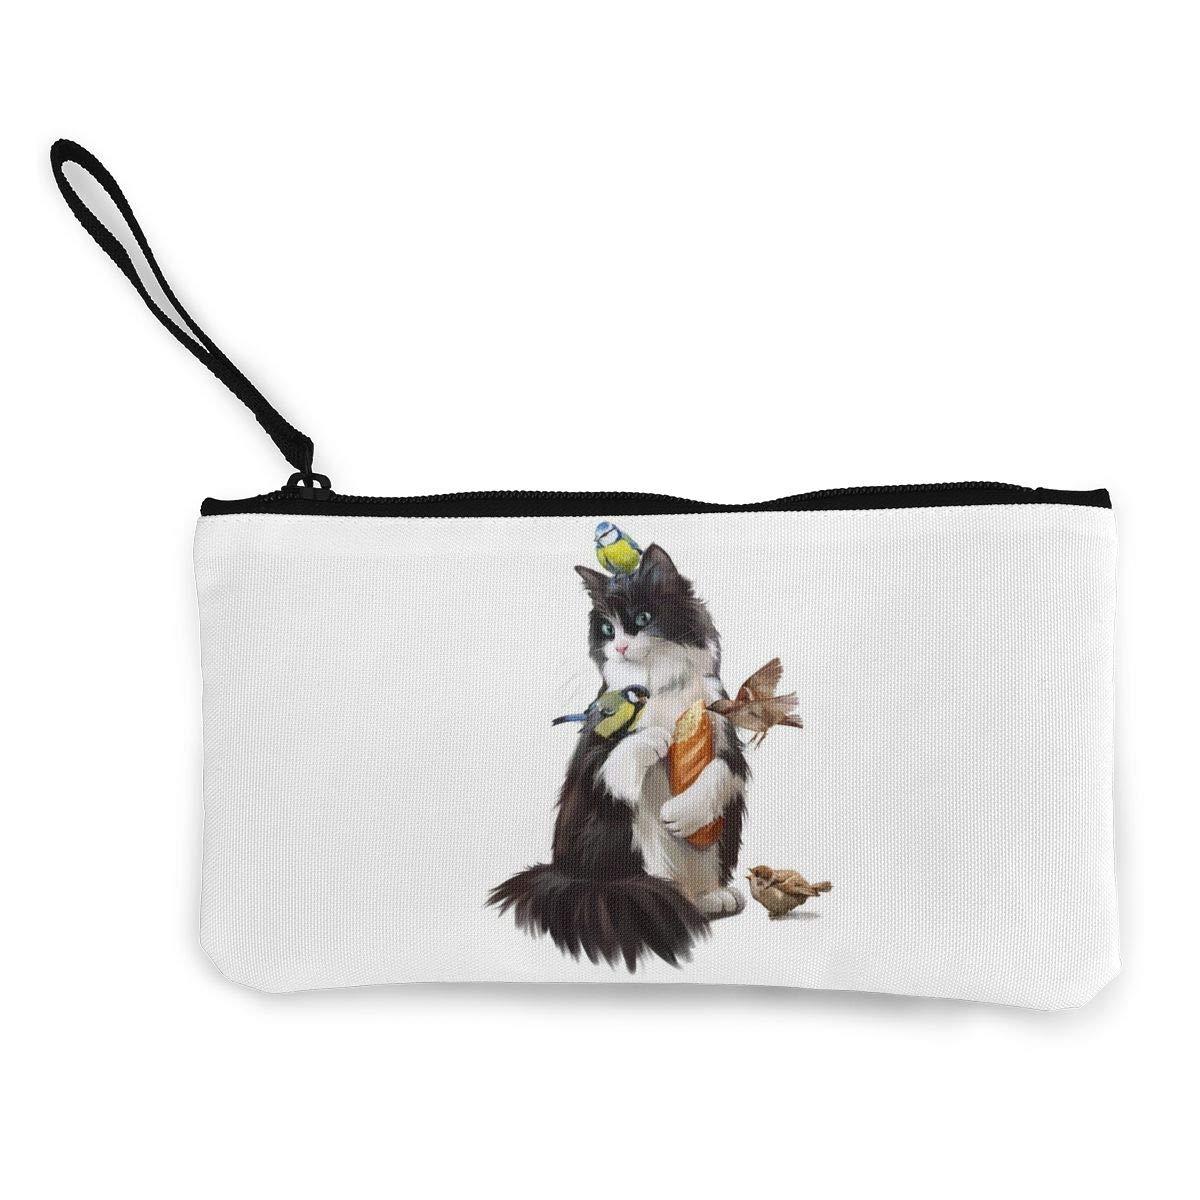 Canvas Cash Coin Purse,Cat /& Birds Print Make Up Bag Zipper Small Purse Wallets